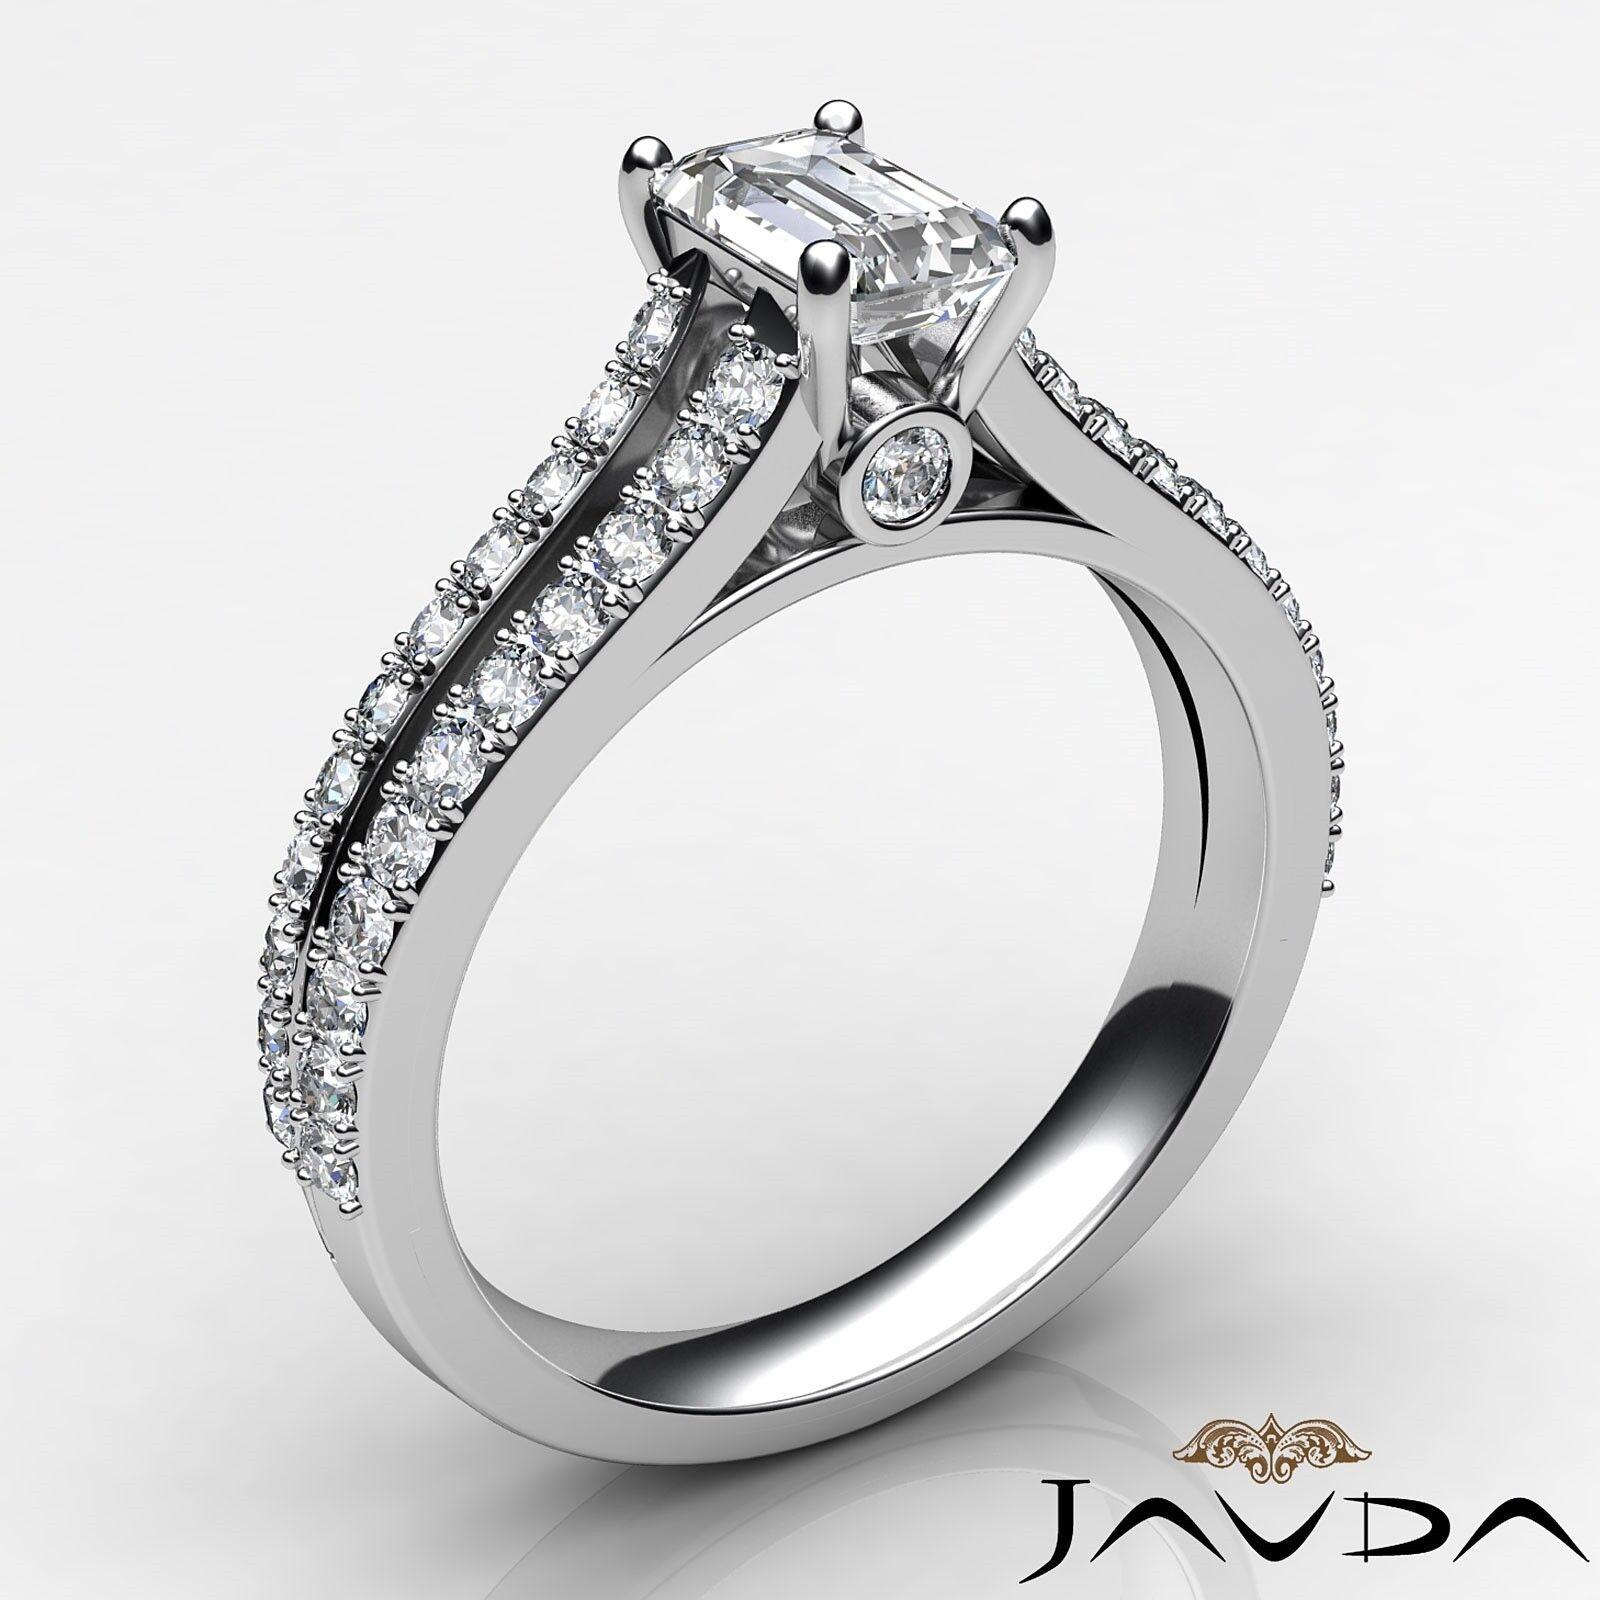 1.45ctw Prong Split Emerald Diamond Engagement Ring Band GIA E-VVS2 White Gold 1